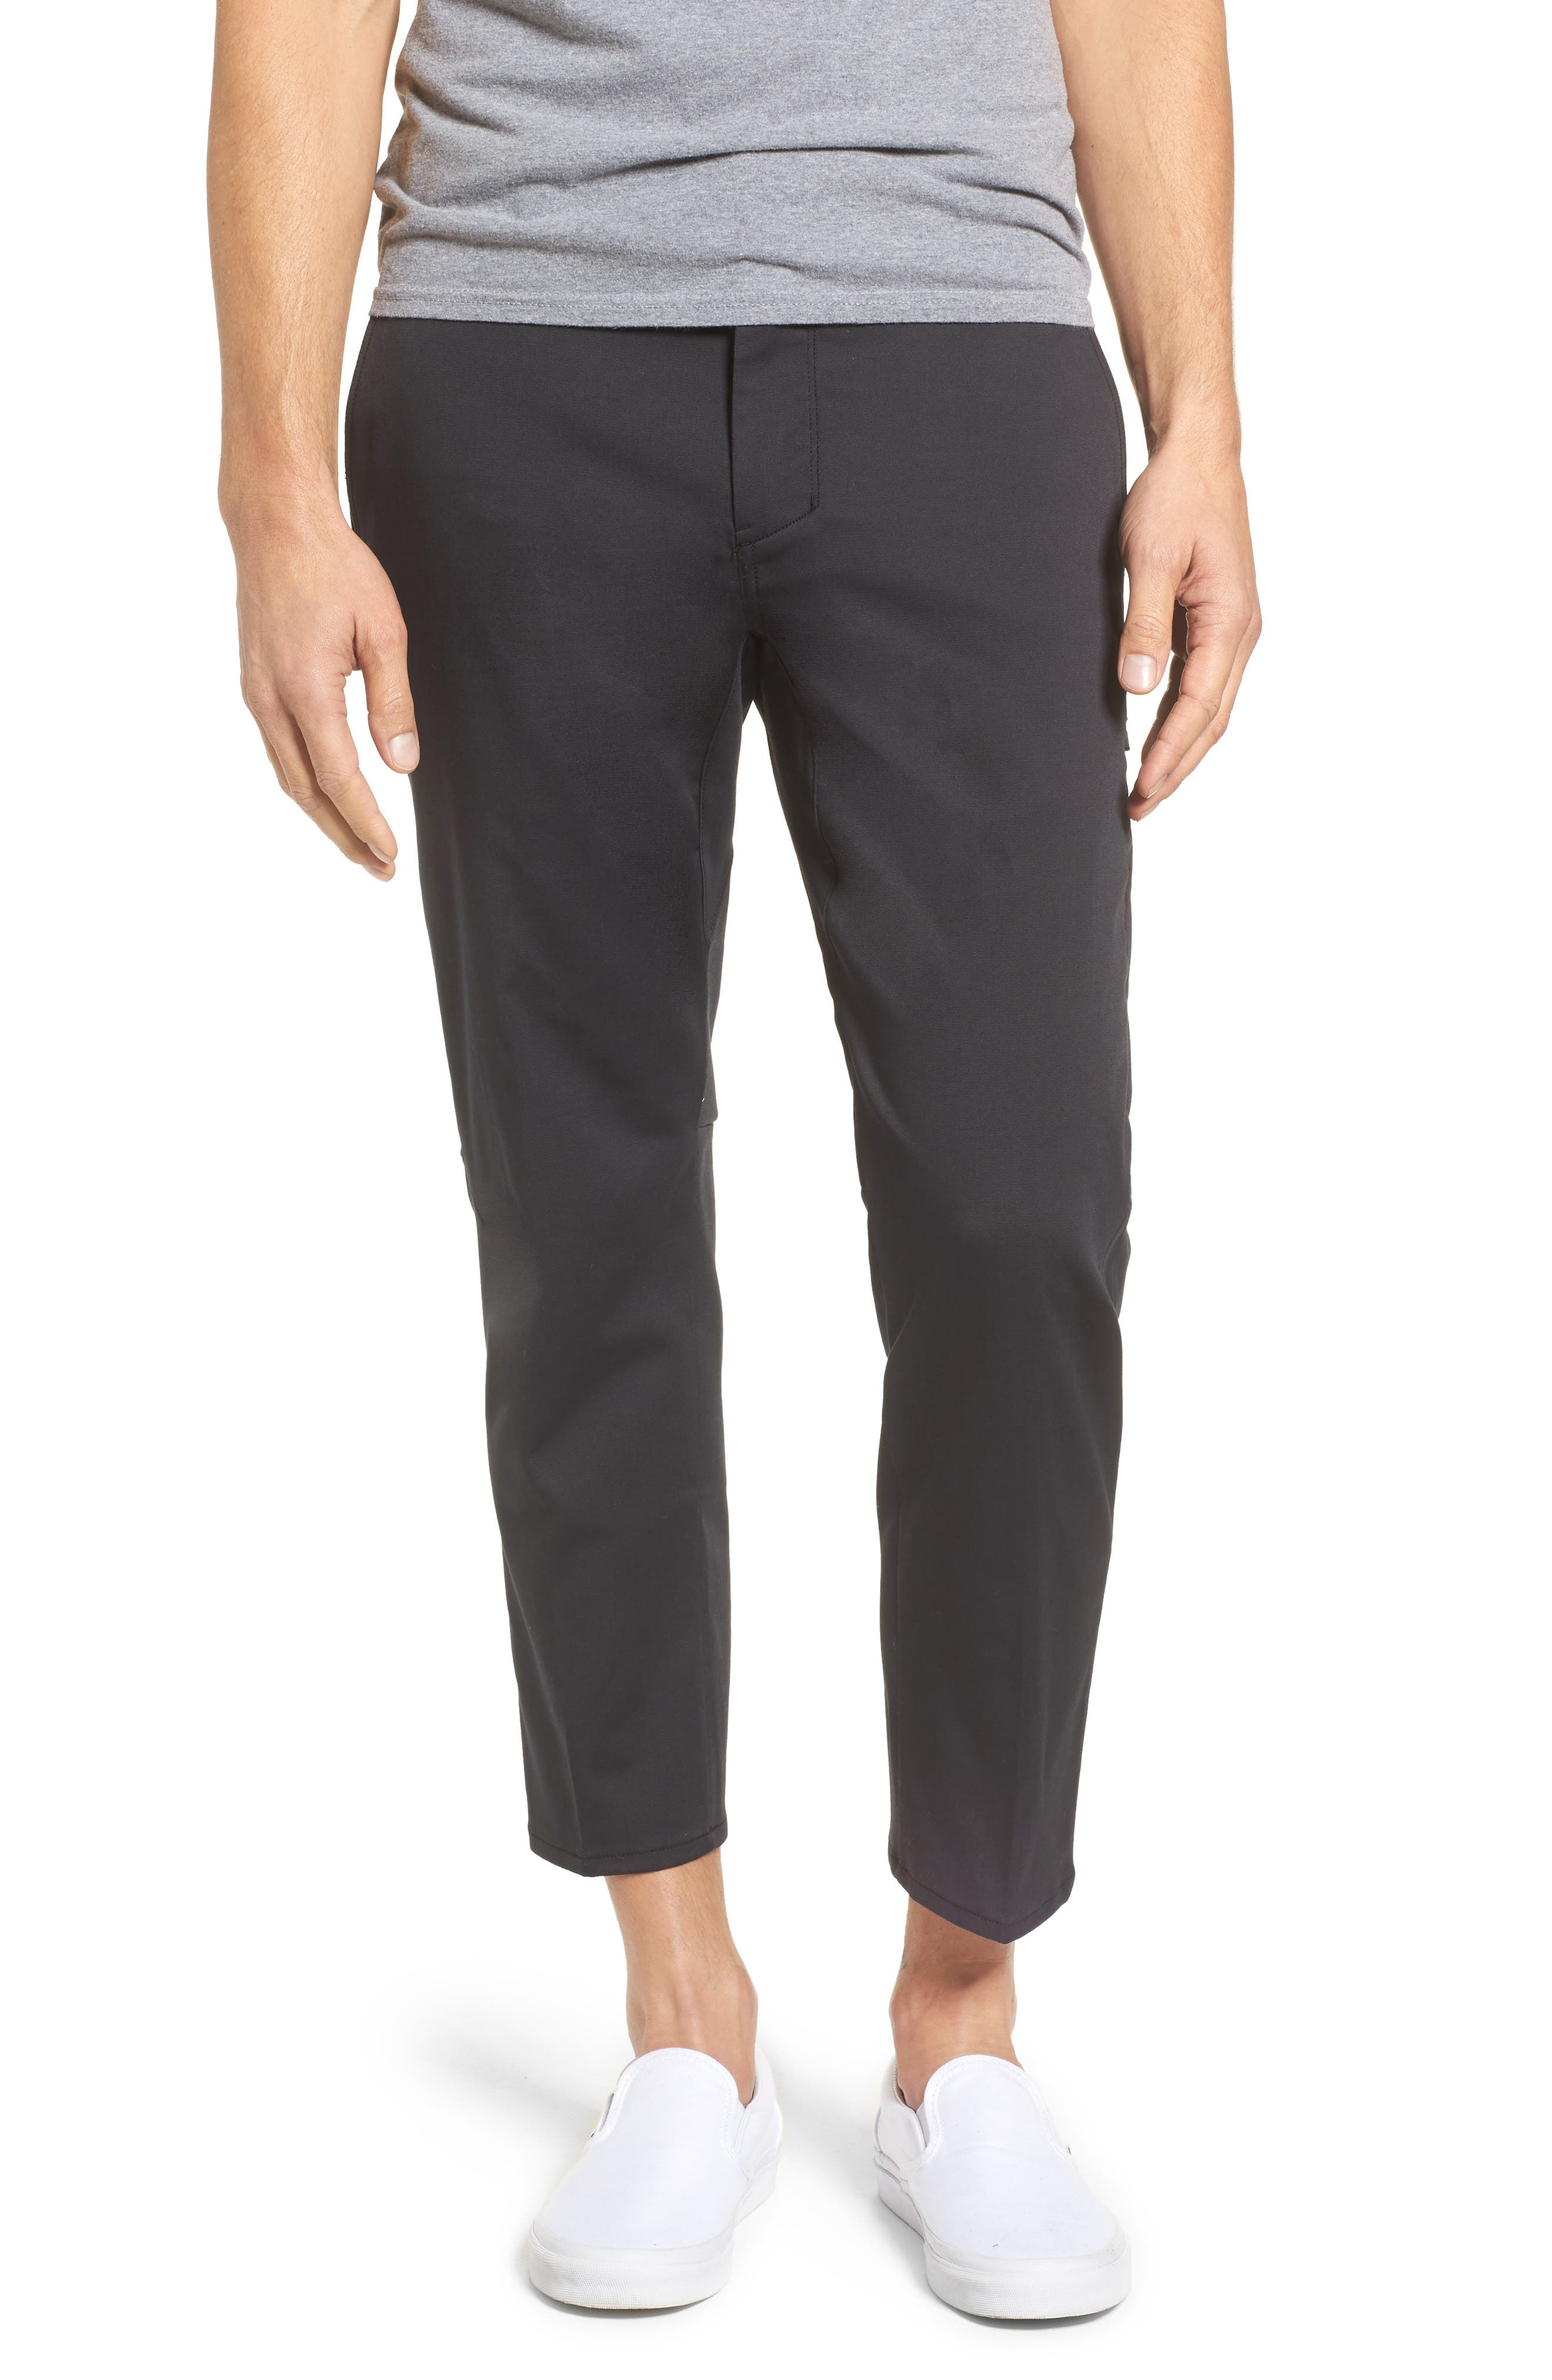 Covert Slim Fit Crop Pants,                         Main,                         color, Black